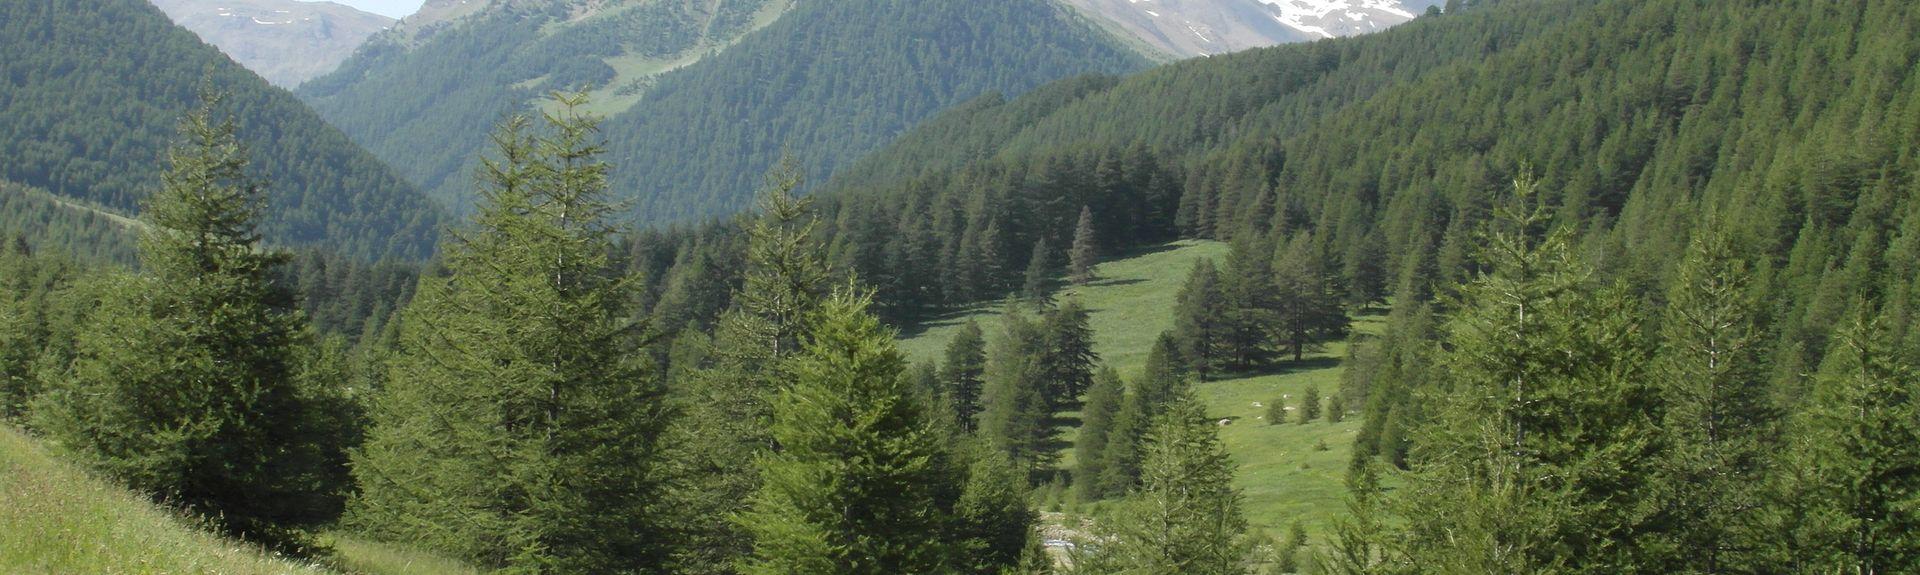 Uvernet-Fours, Provenza-Alpes-Costa Azul, Francia